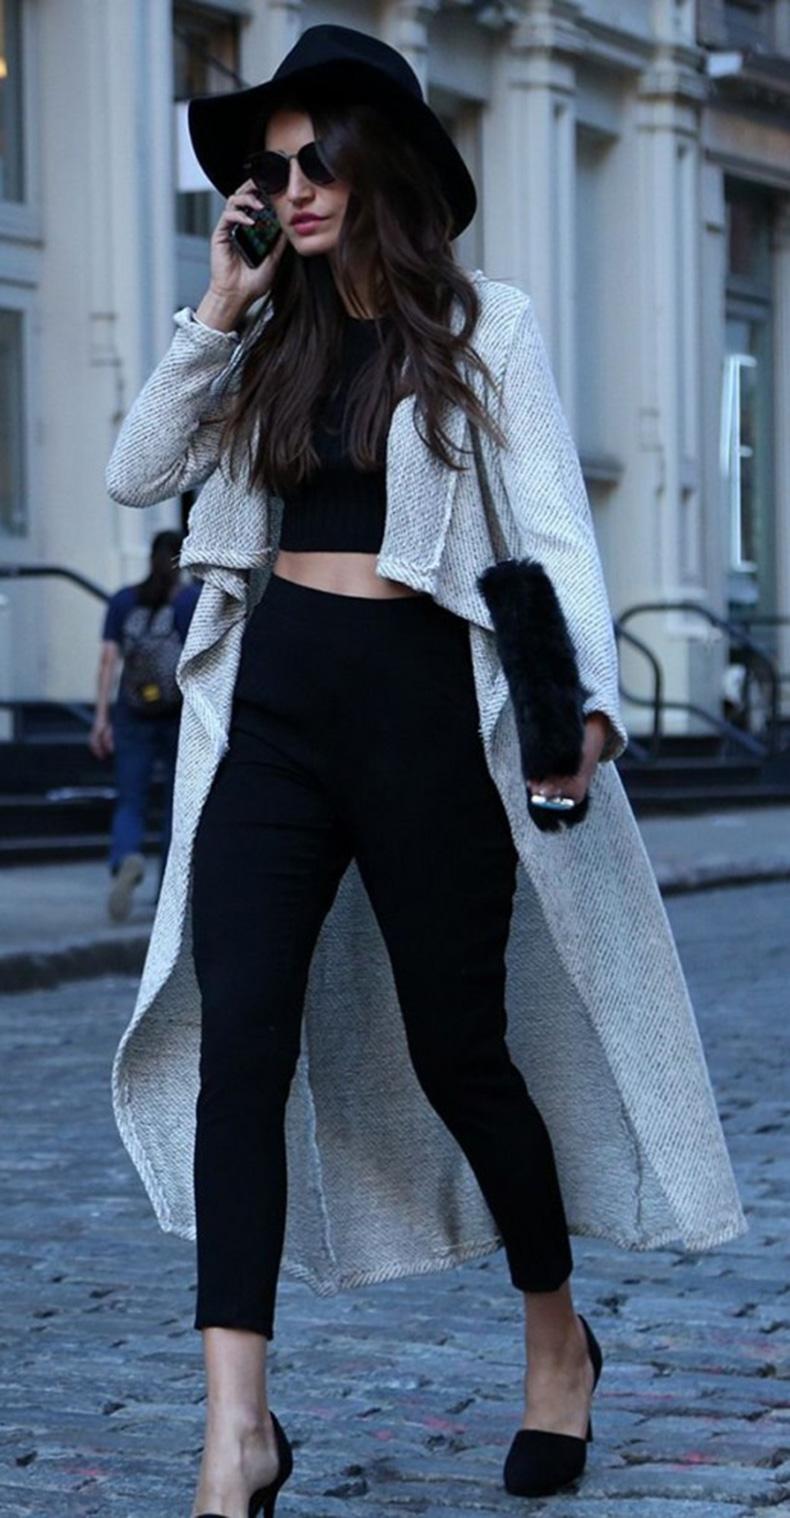 winter-crop-top-outfit-idea-520x999